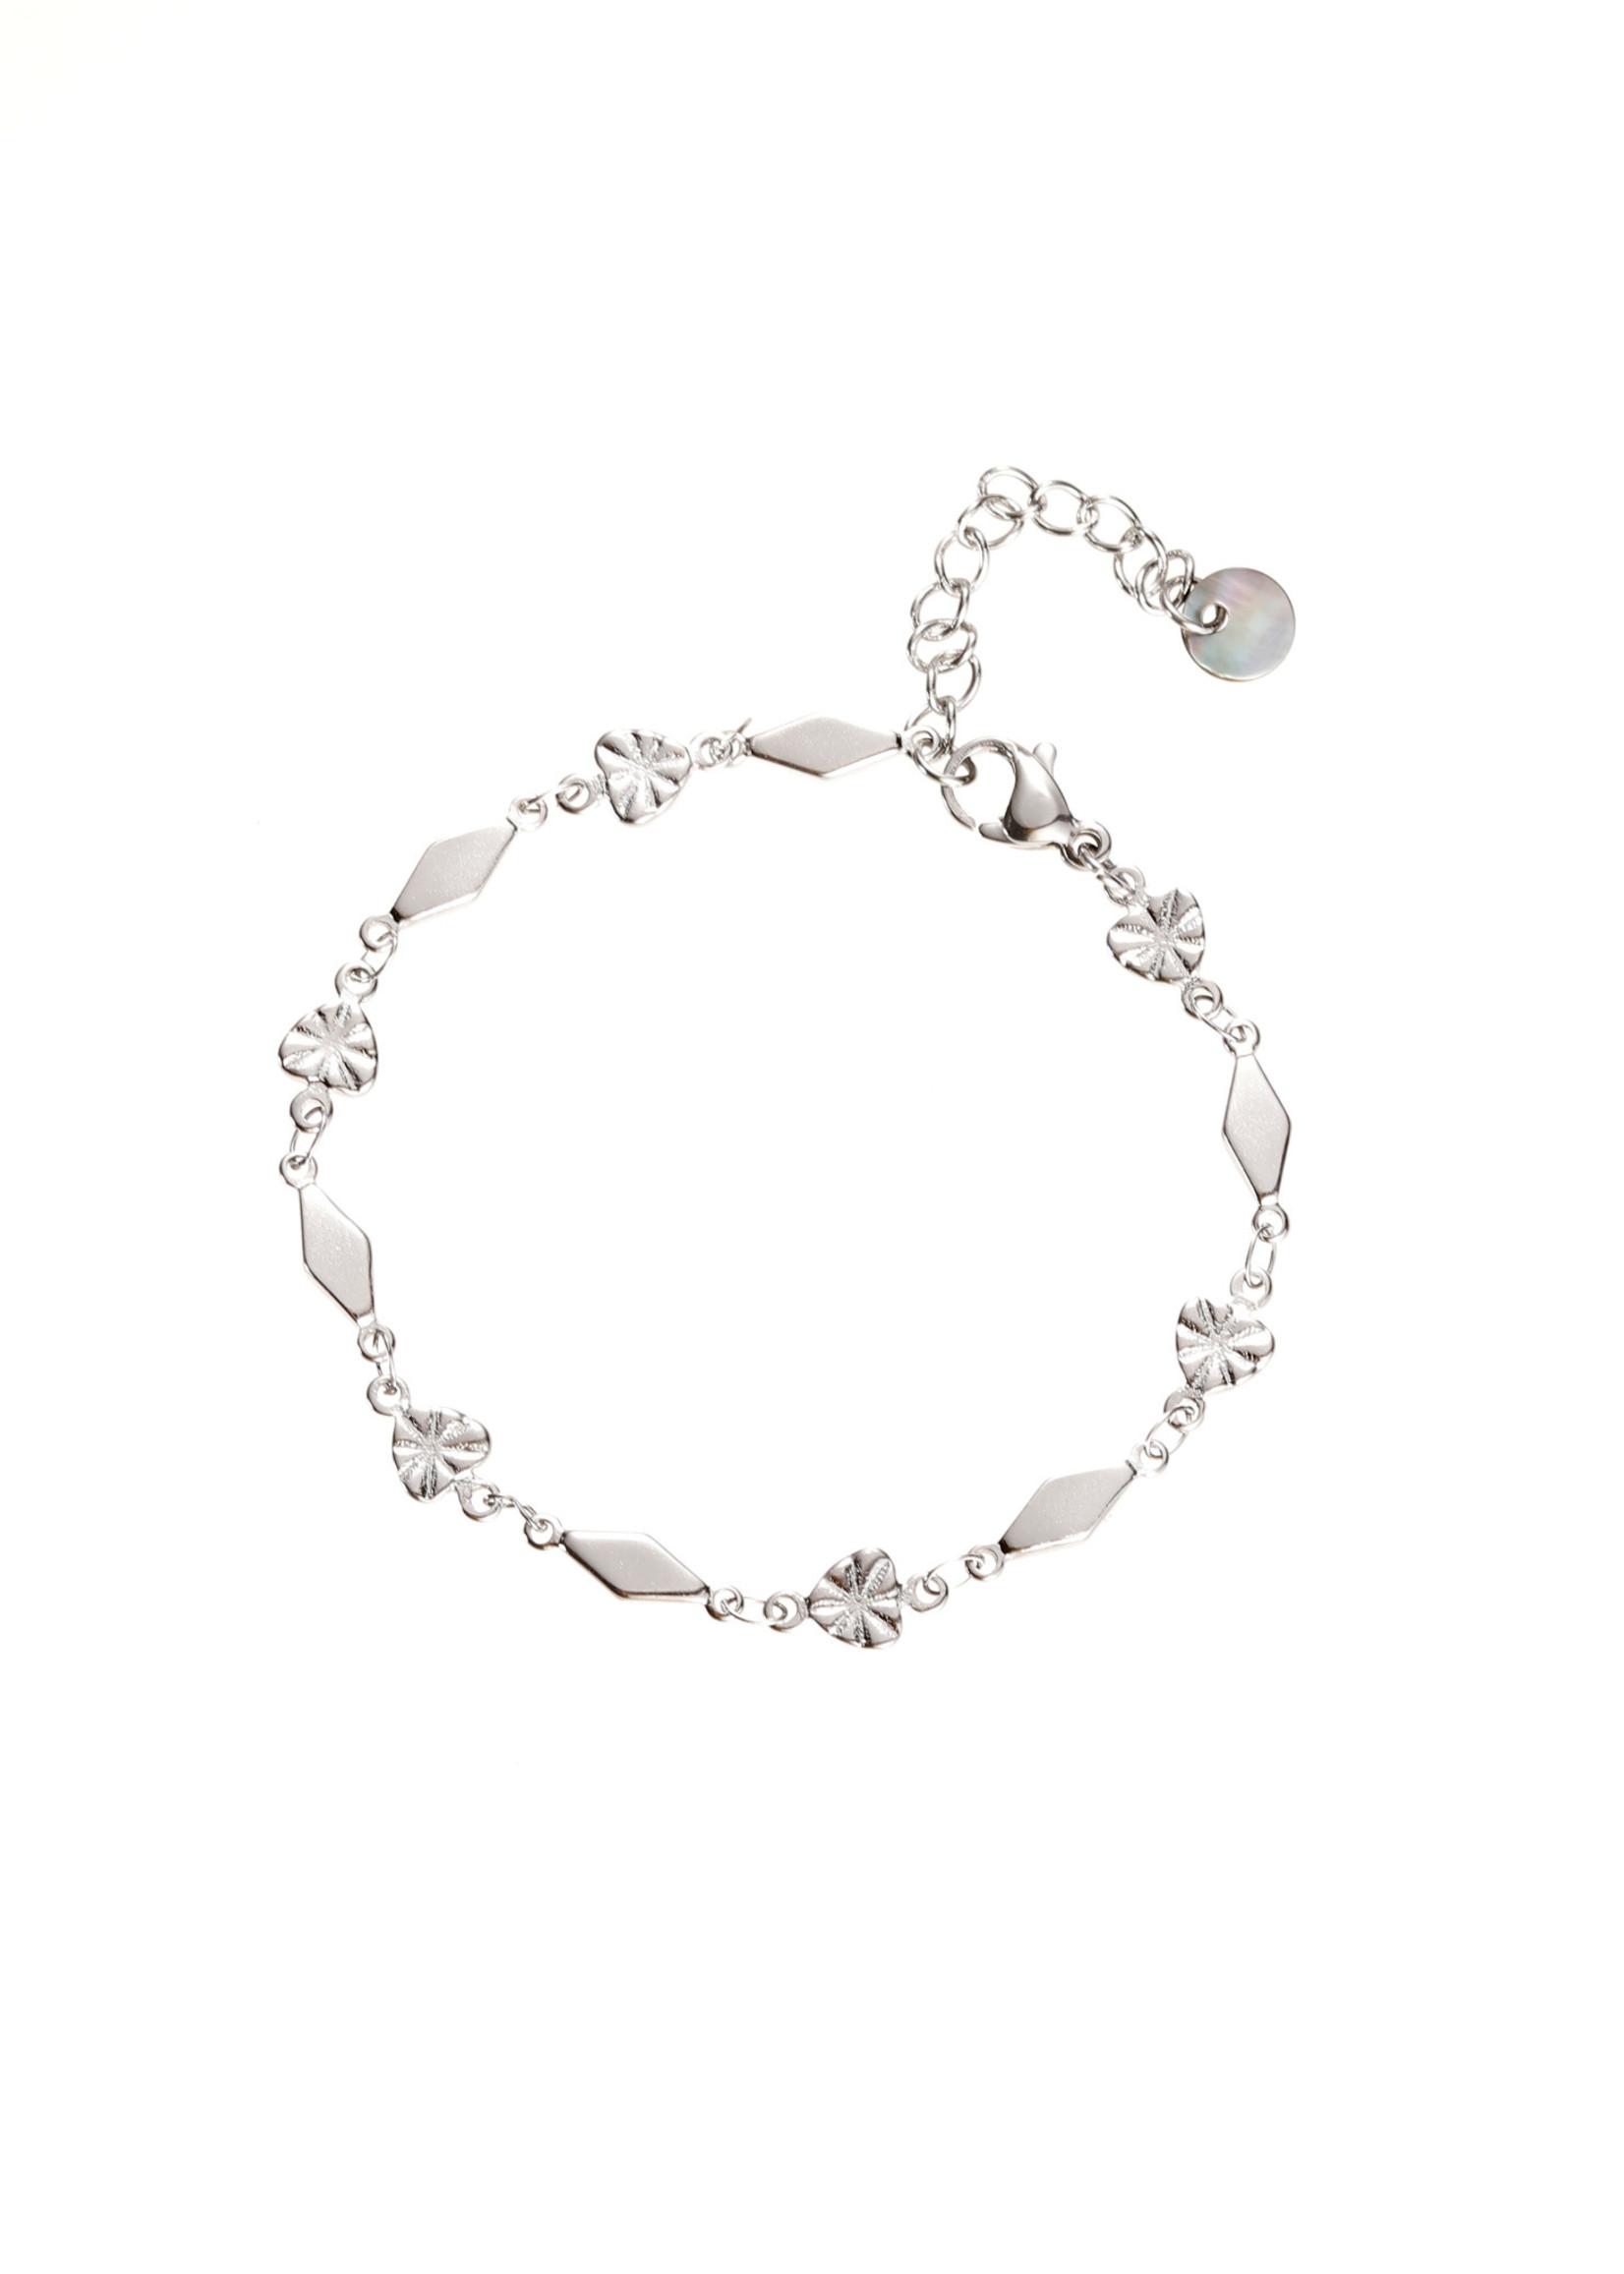 Armband zilver hartjes en ruitjes B1862-1